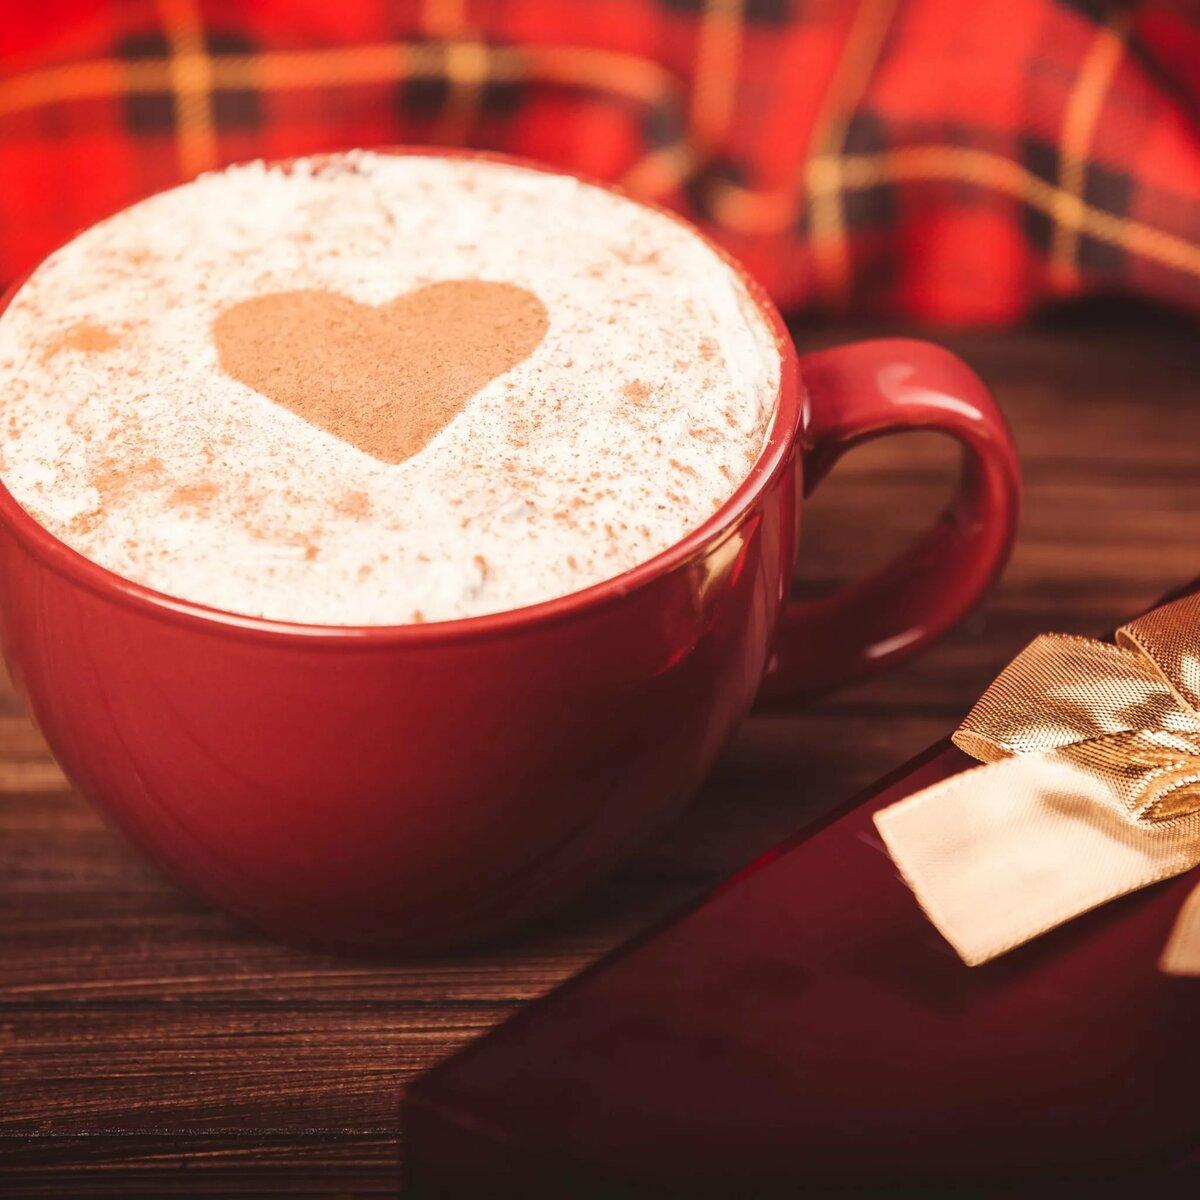 днях фото чашечки кофе с сердечком давайте